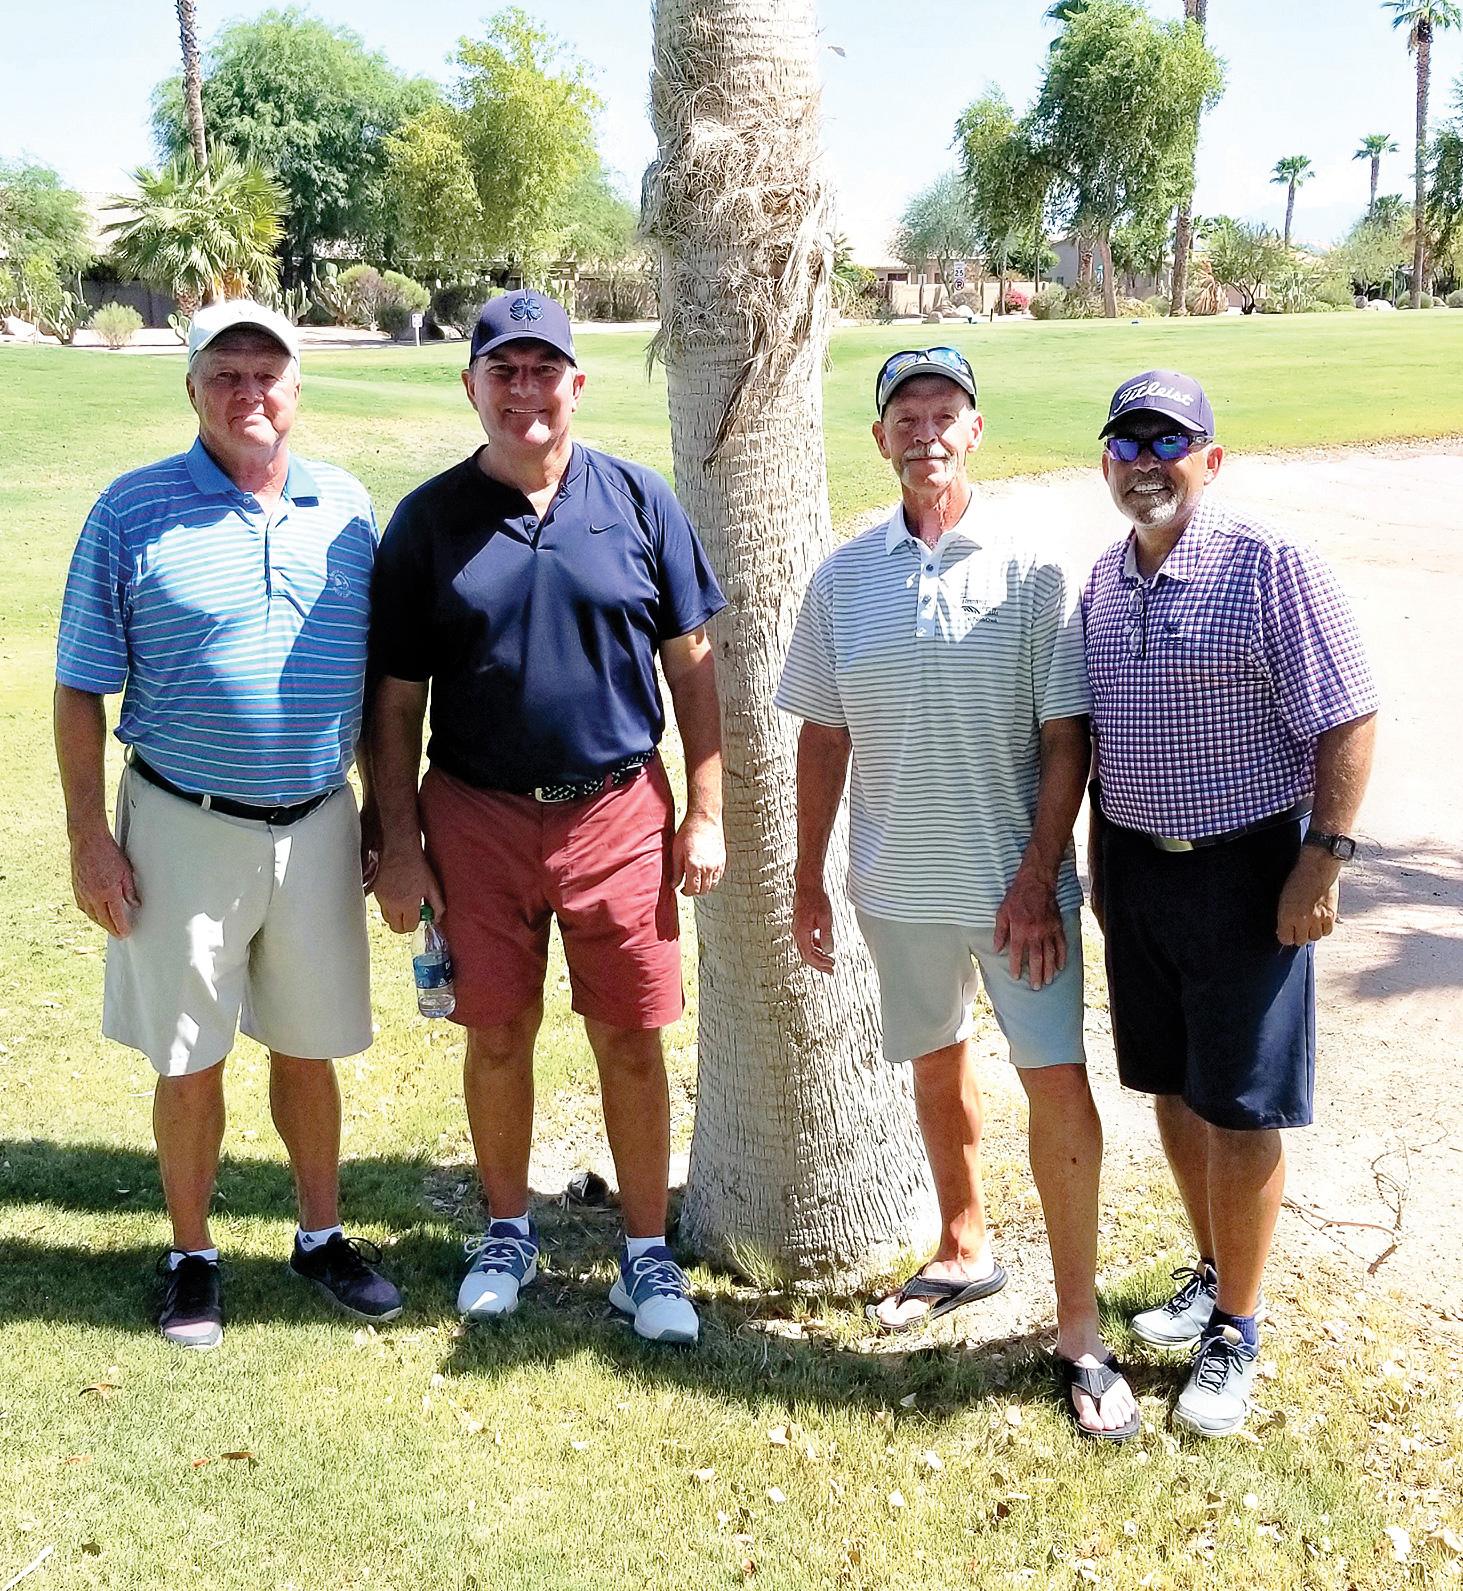 Gross/net flight winners (left to right): Bill McKinney, Brian Lorenzo, Dave Green, and Reuben Rivera